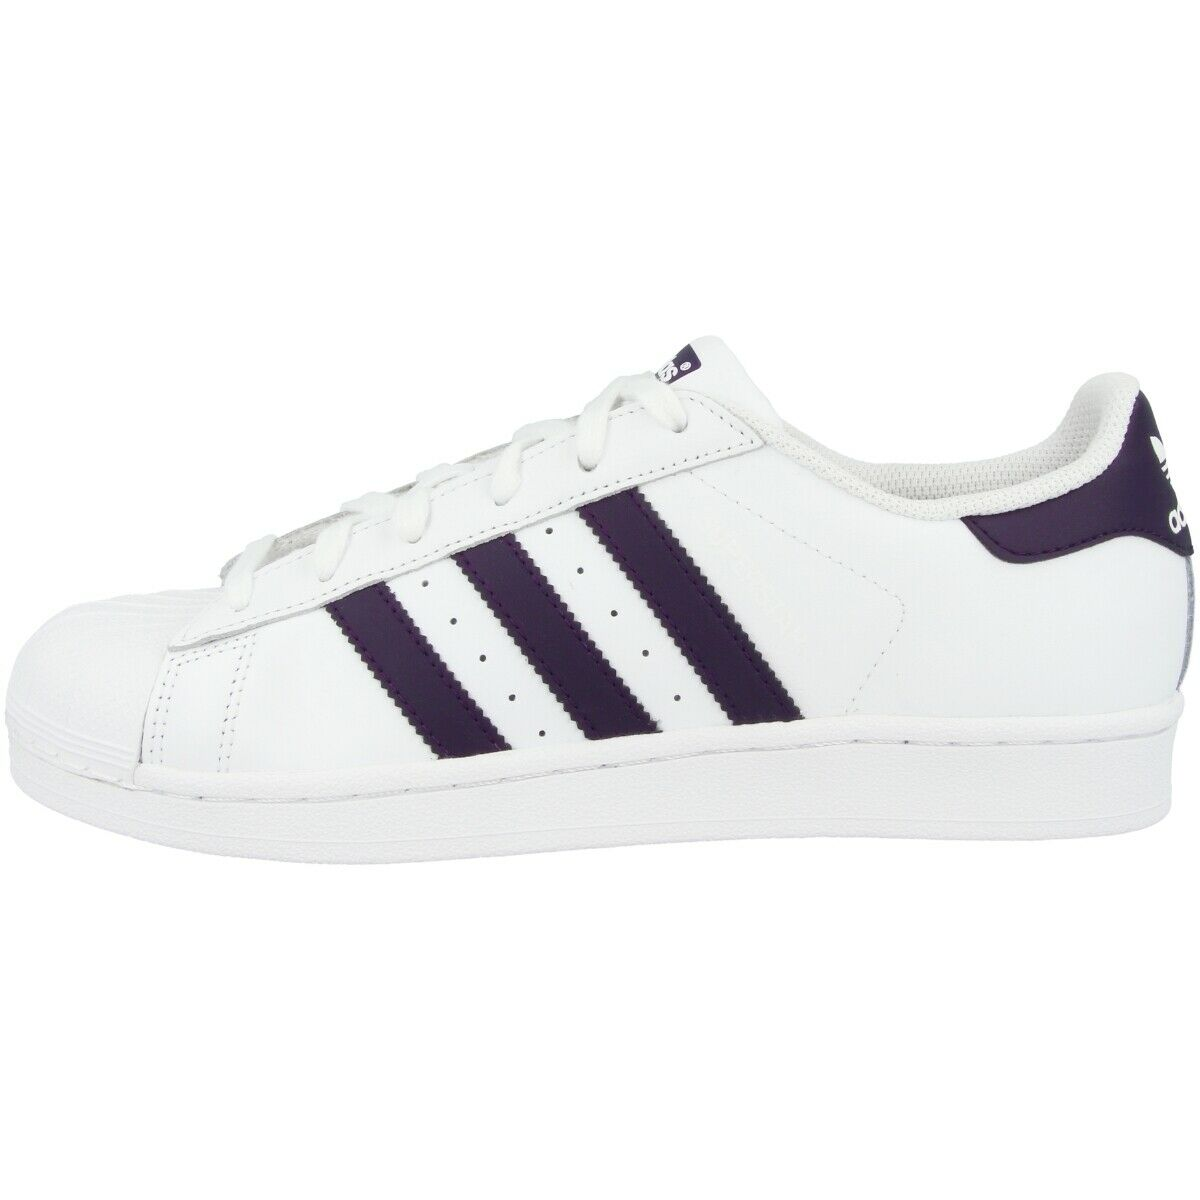 1531ce55e1e3c Adidas shoes women women Retrò Sneakers Casual Black DB3346 Superstar White  nolssi2915-Athletic Shoes - climbing.mbrooksfit.com